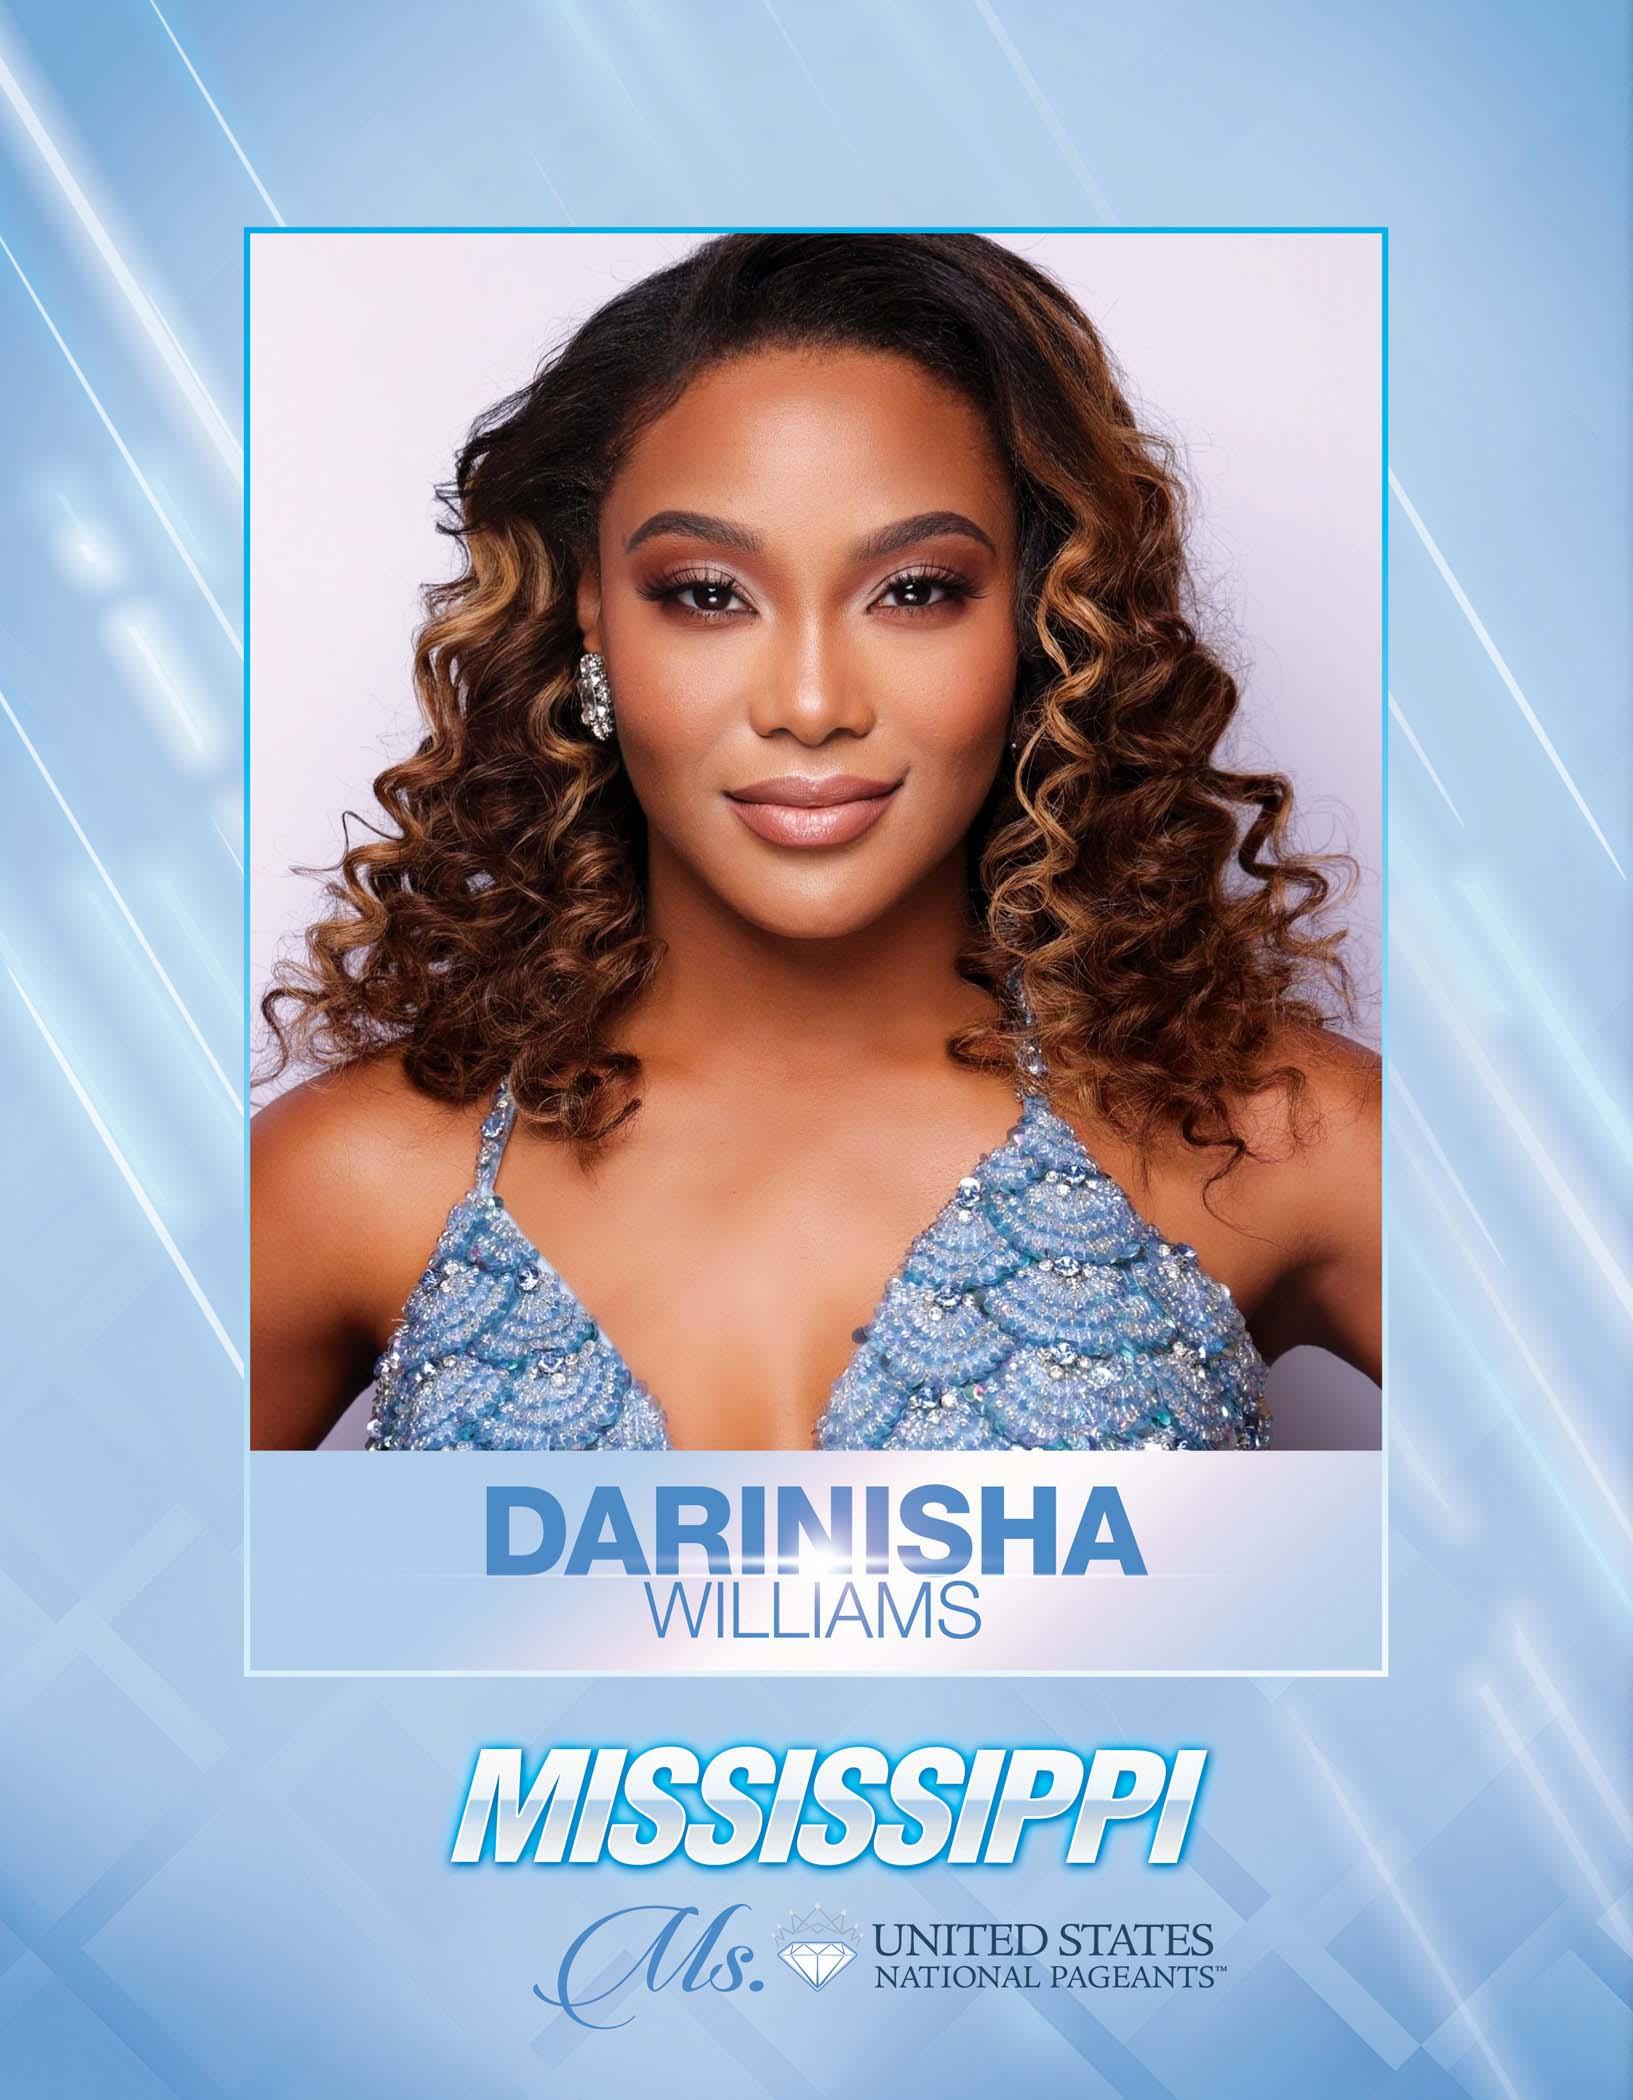 Darinisha Williams Ms. Mississippi United States - 2021